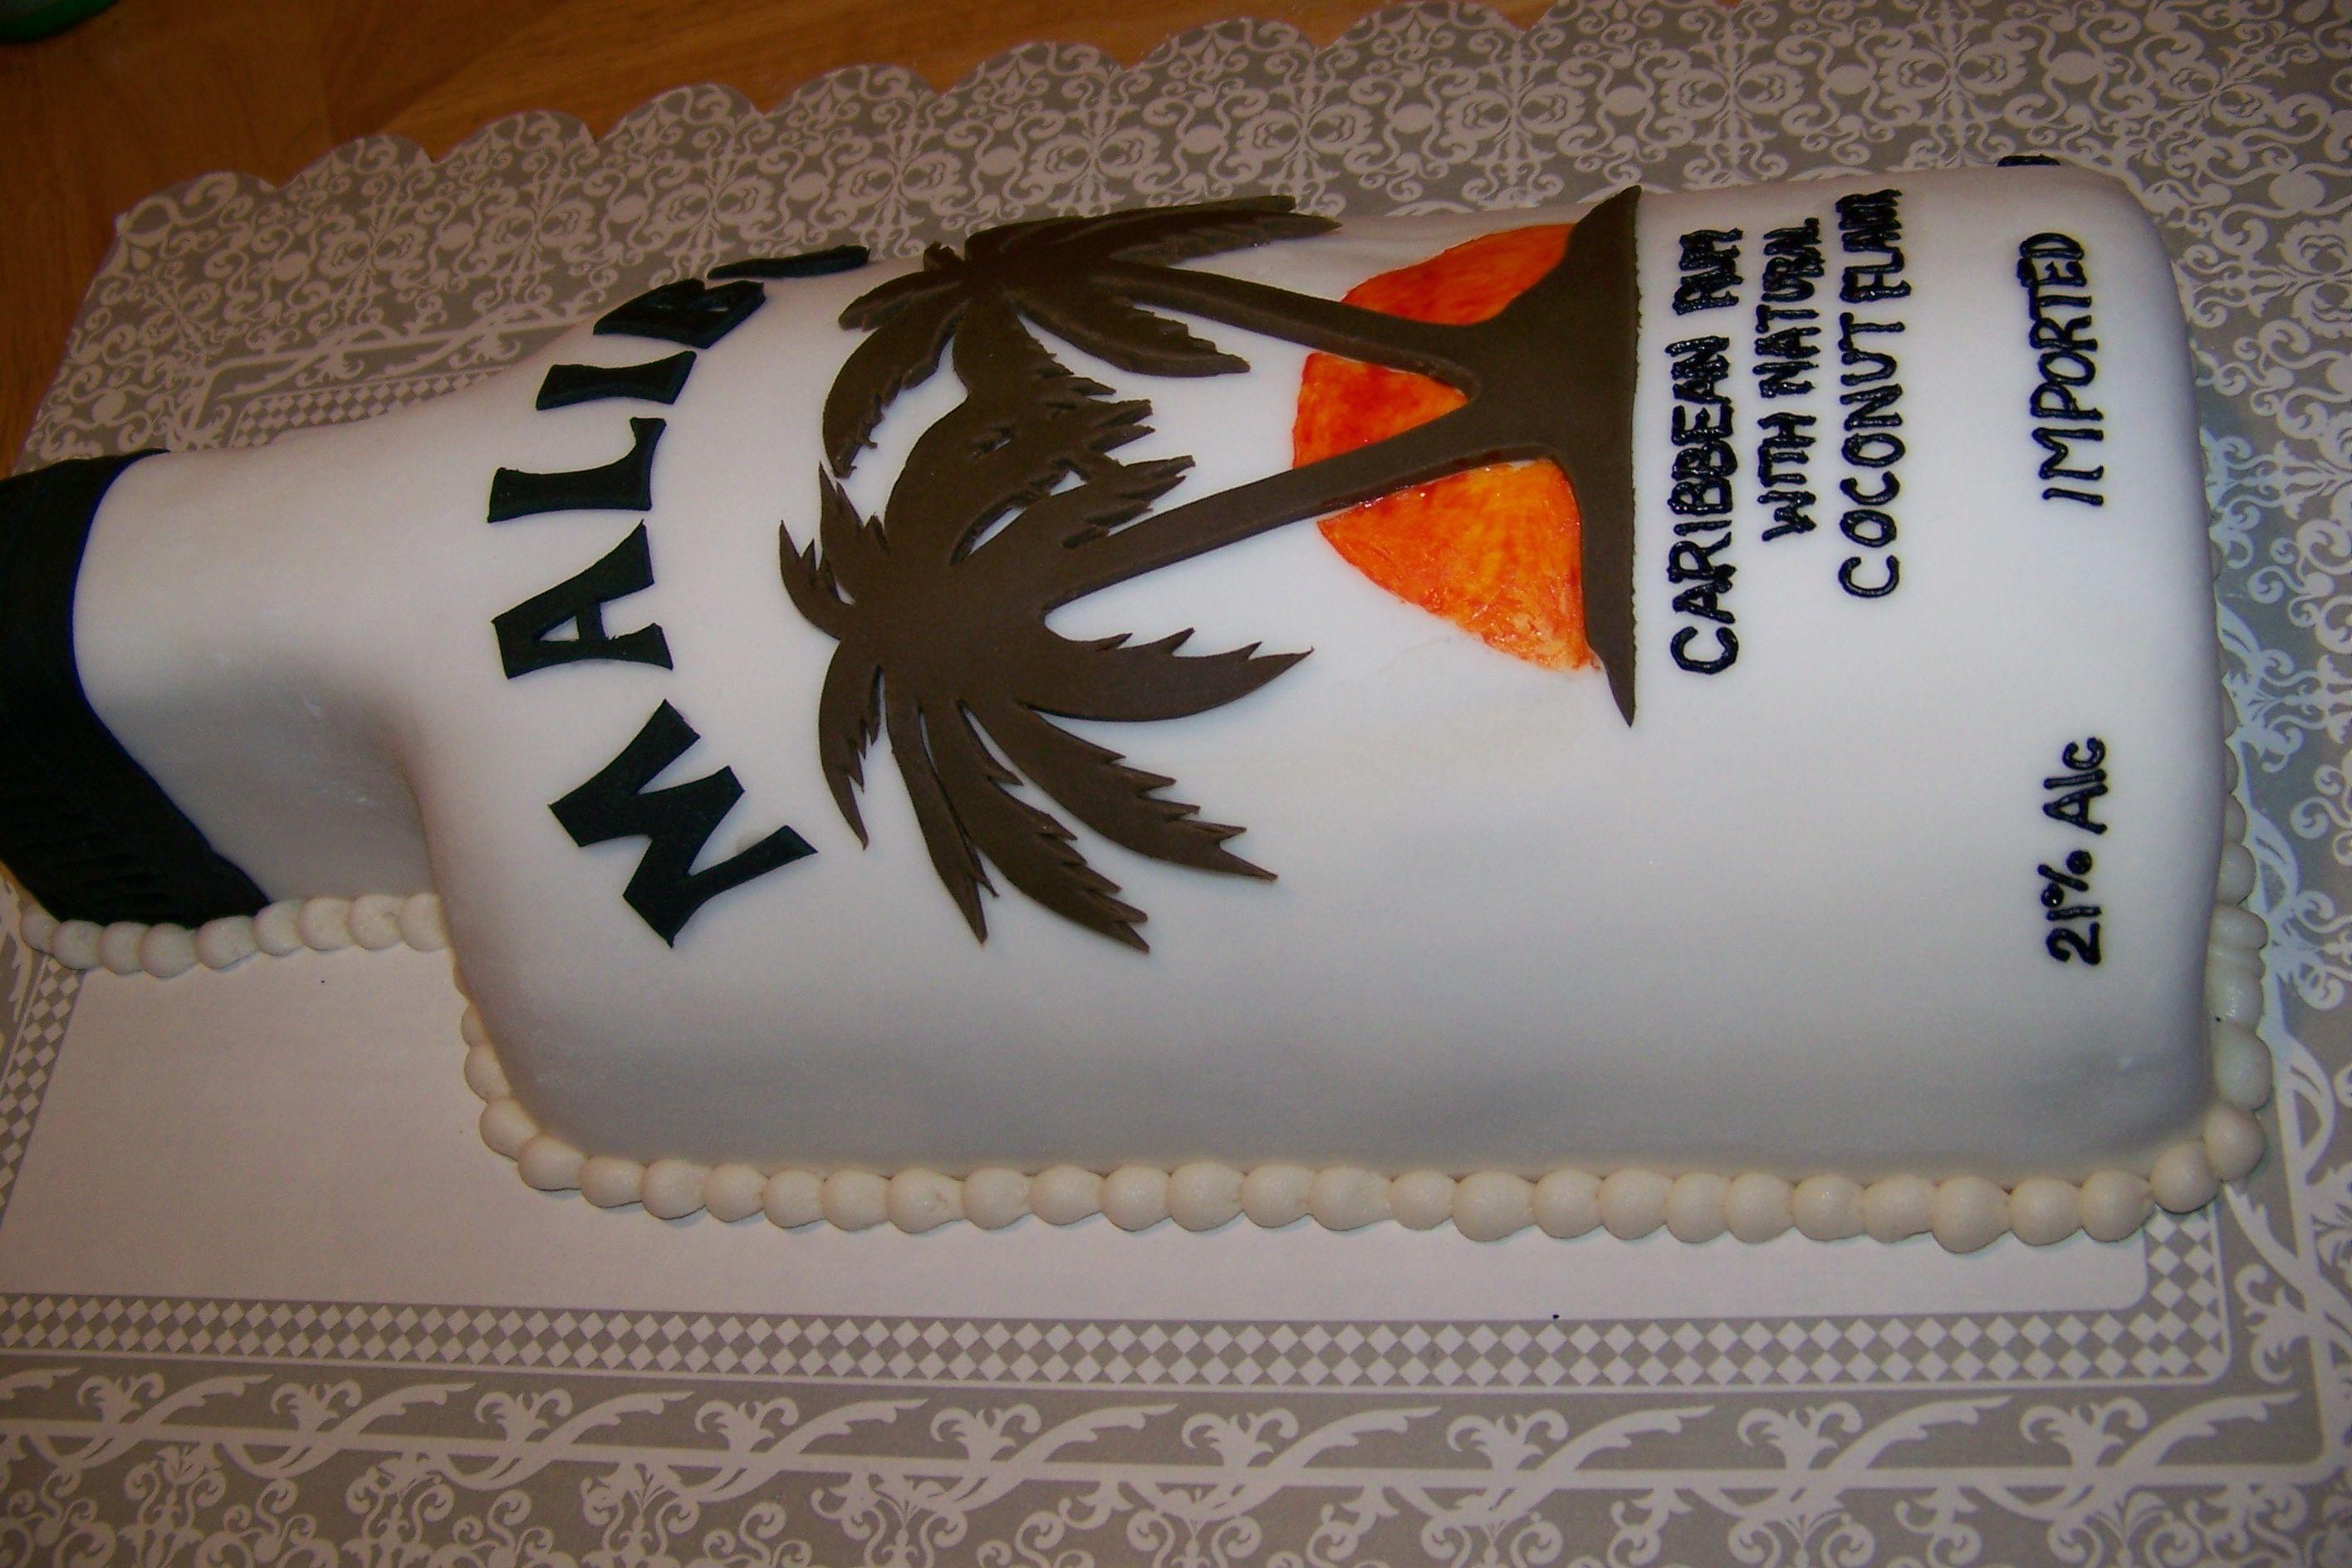 Malibu Rum Cake Malibu Rum Bottle Cake Vanilla Cake With